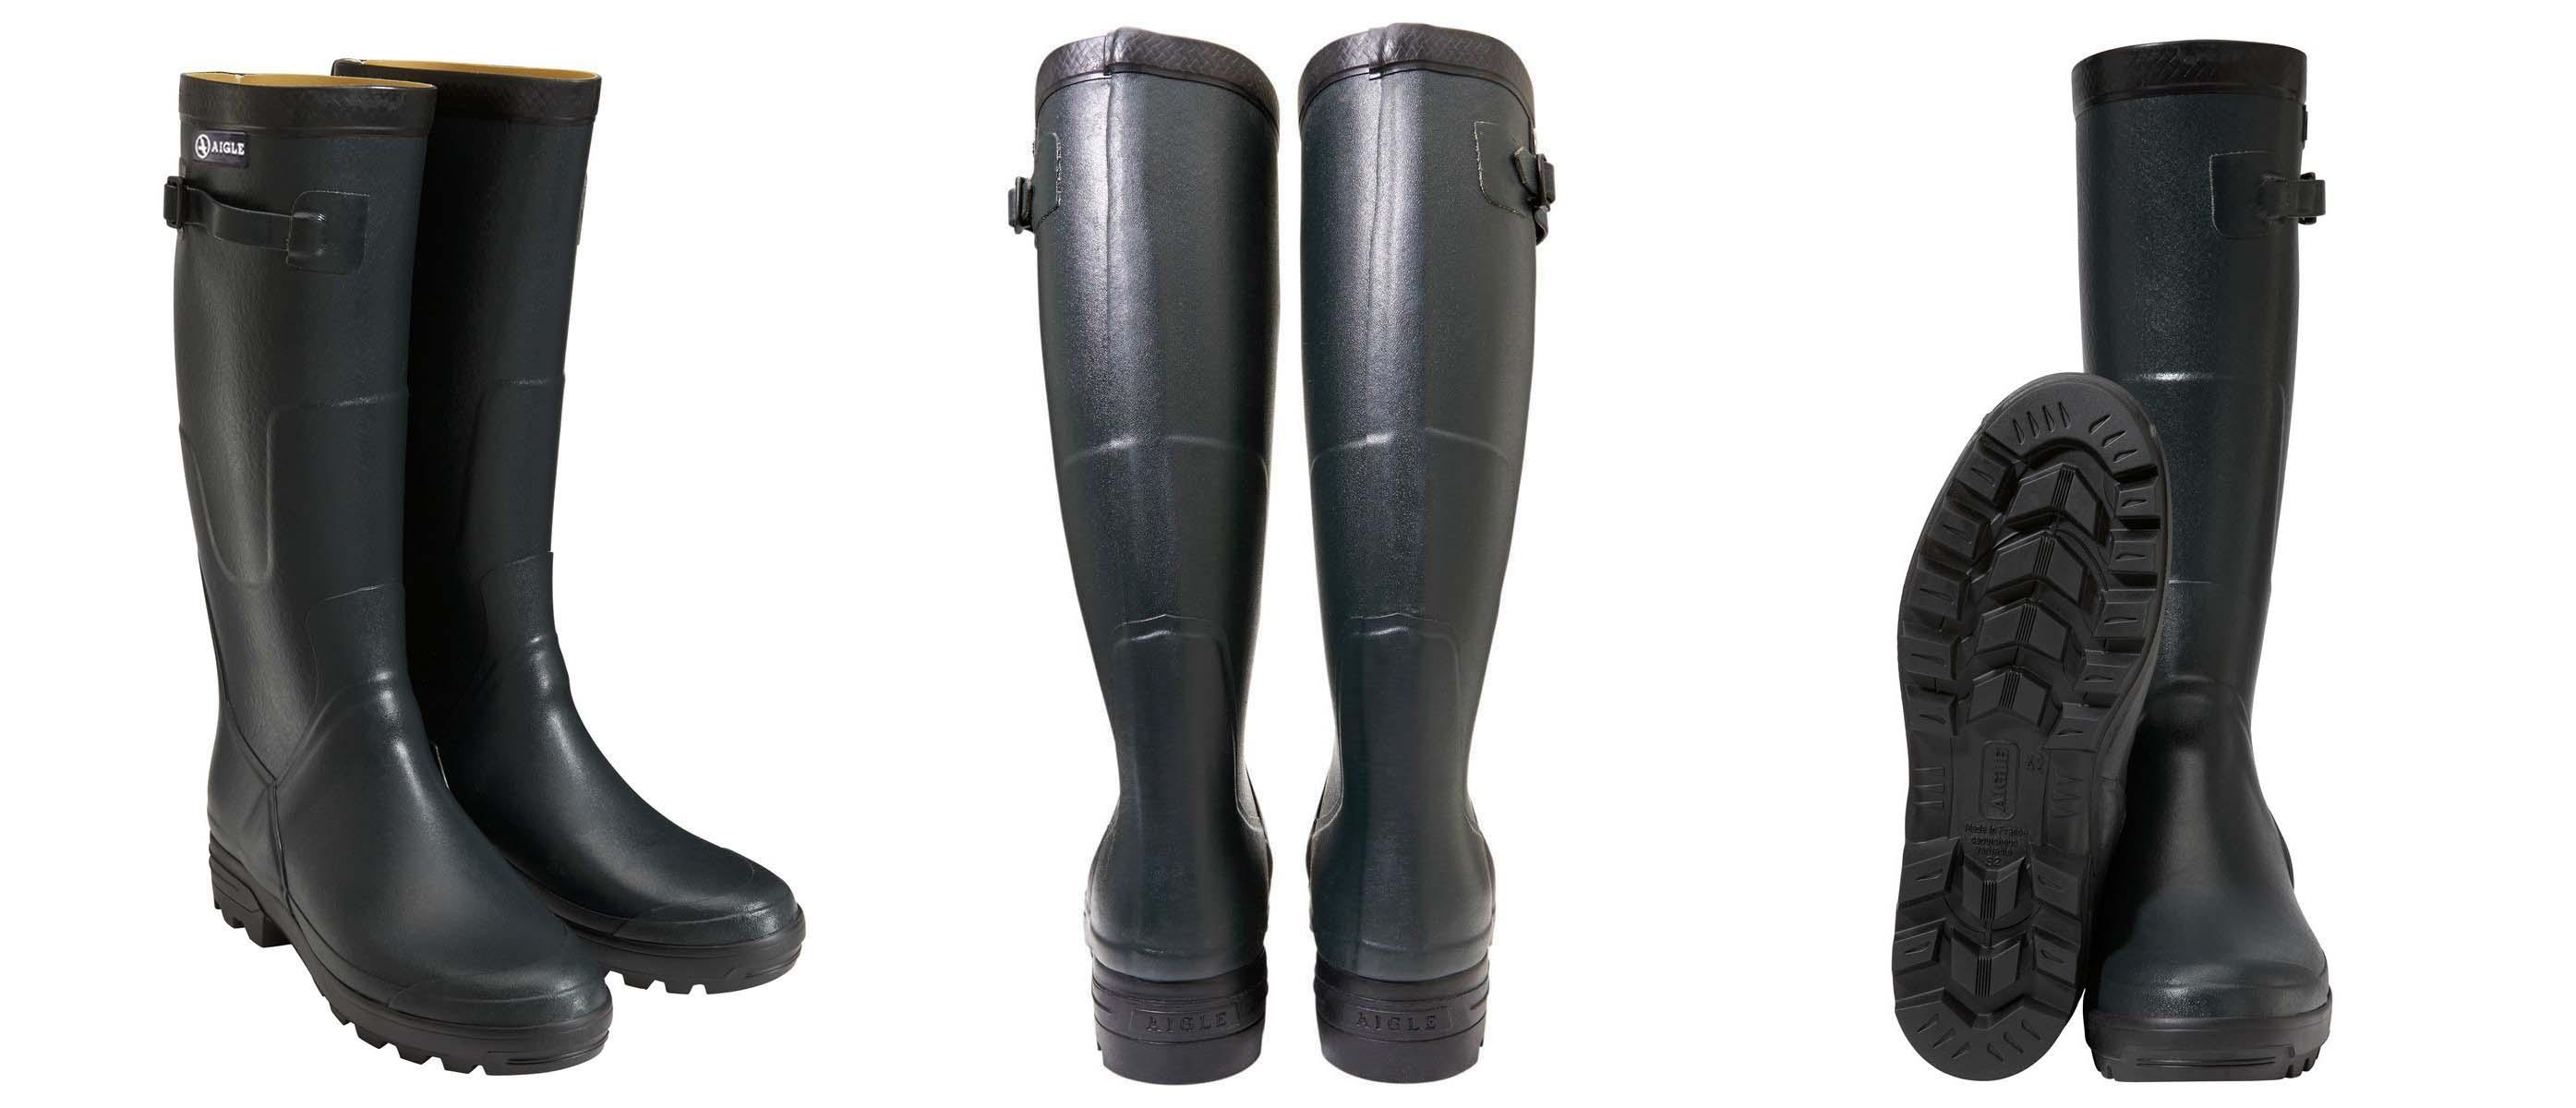 Aigle Boots Benyl Wellies